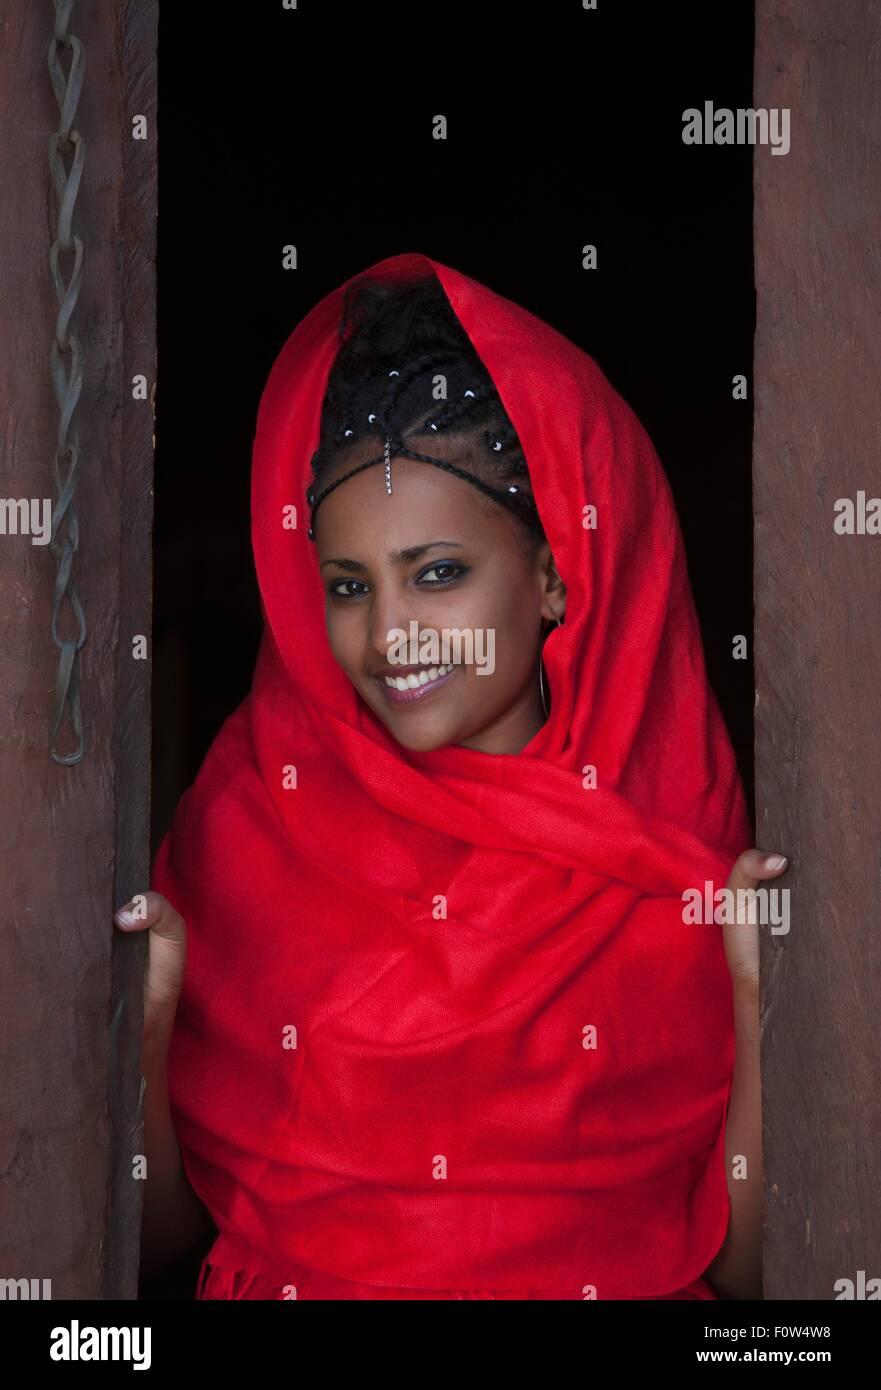 Portrait of young Amhara woman at open door, Ethiopia, Africa - Stock Image